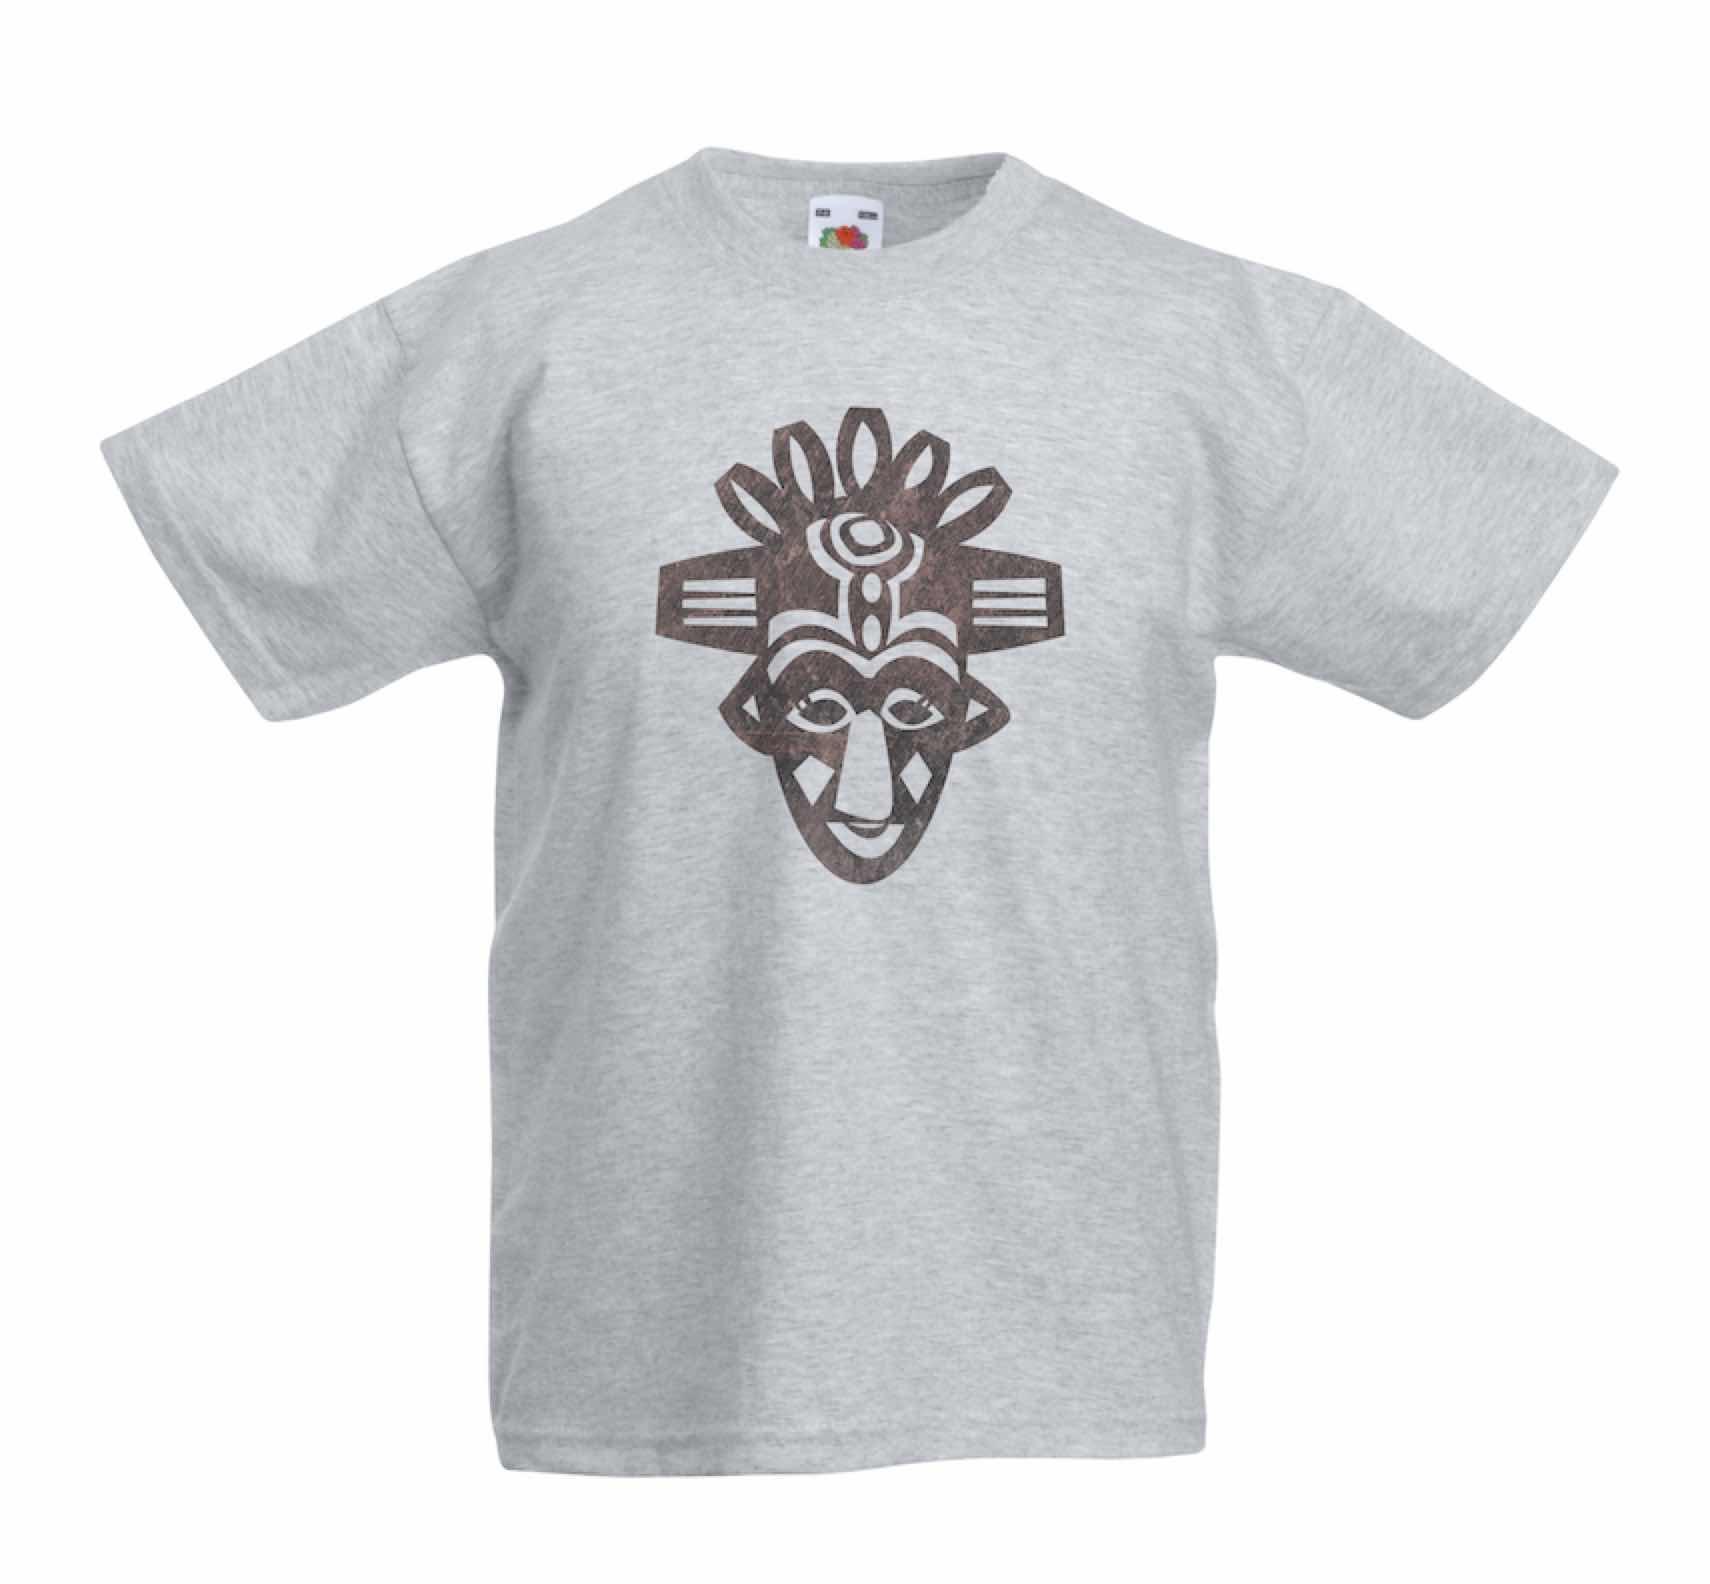 Funny Mask design for t-shirt, hoodie & sweatshirt